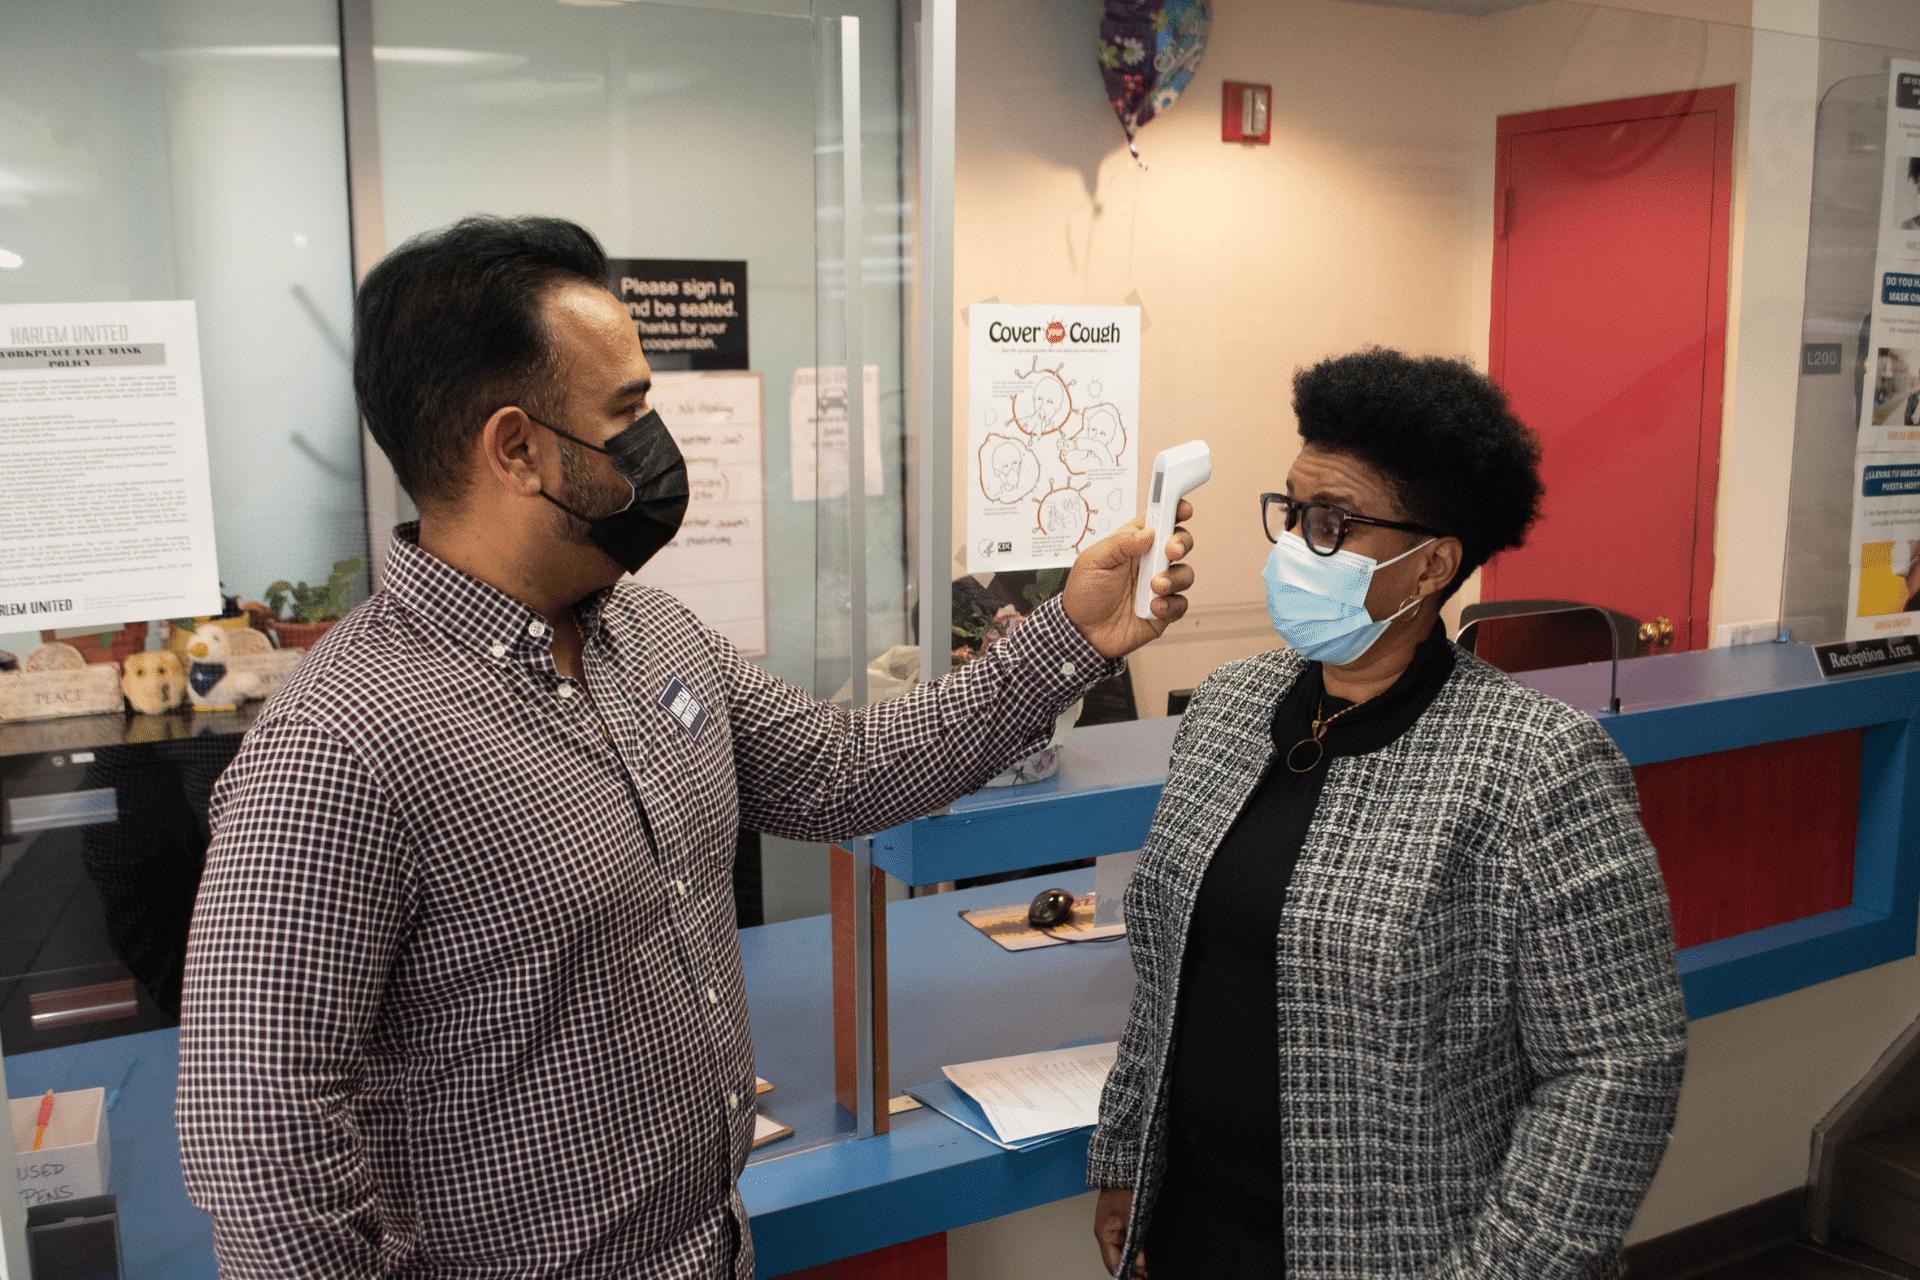 Staff take temperature at Harlem United facility